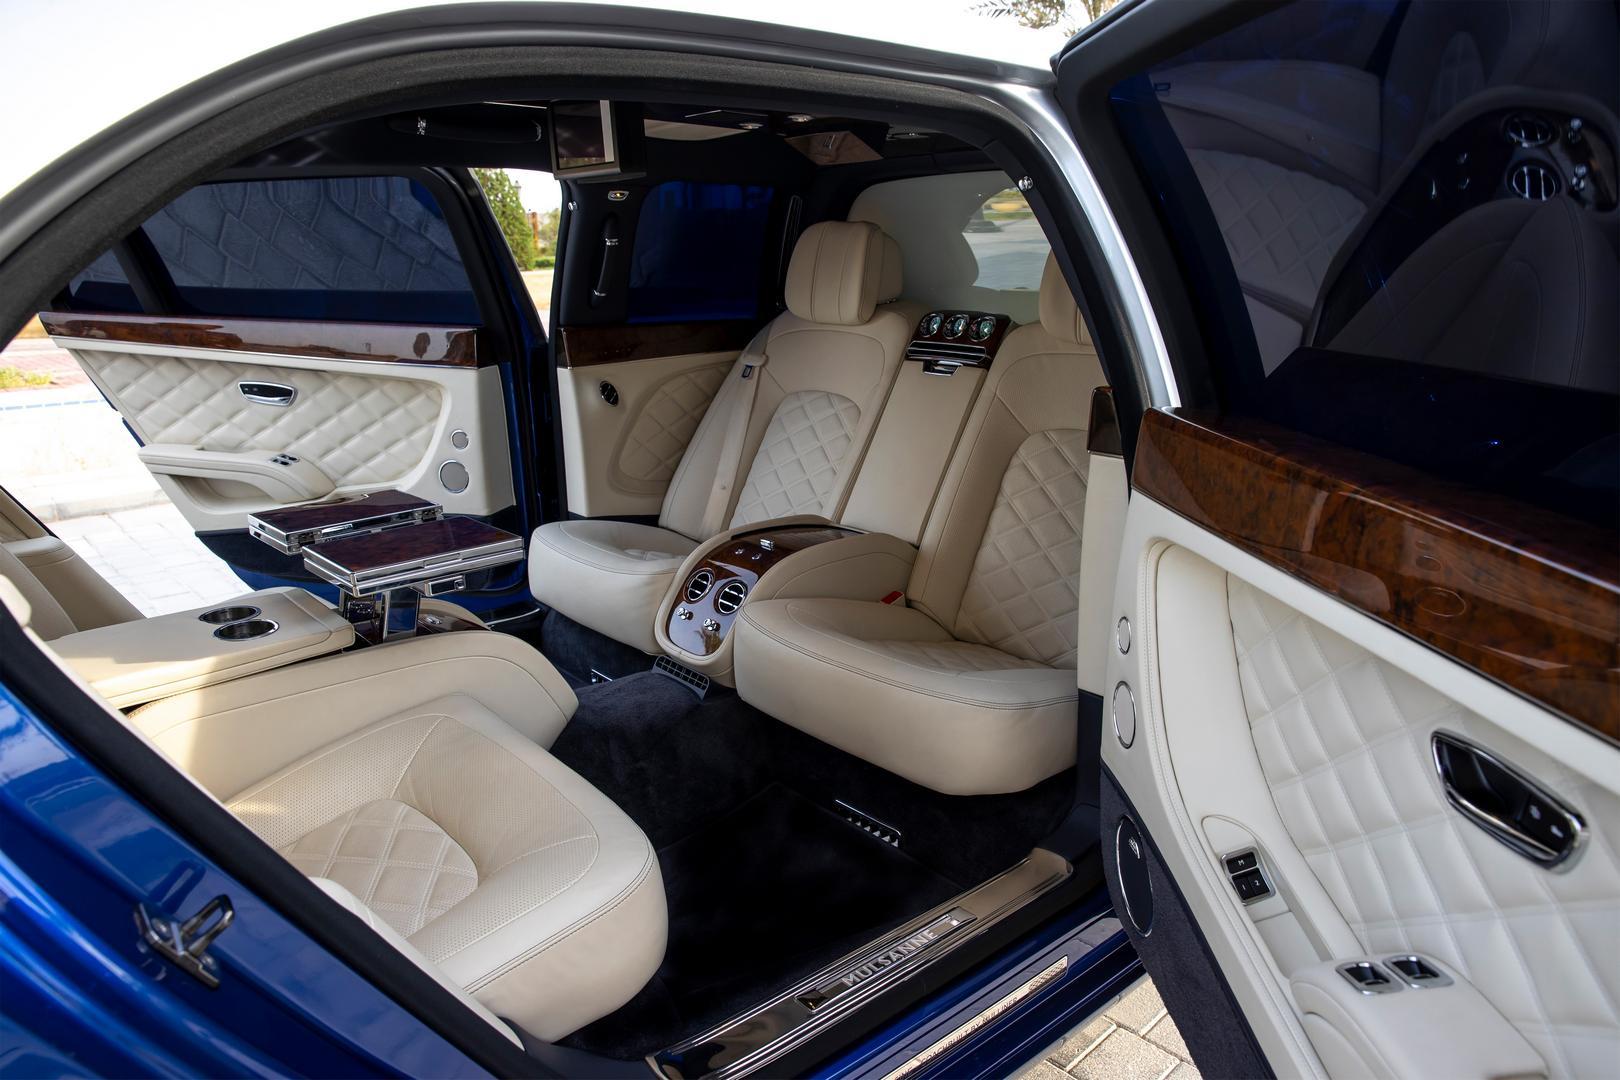 Bentley Mulsanne Grand Limousine seats